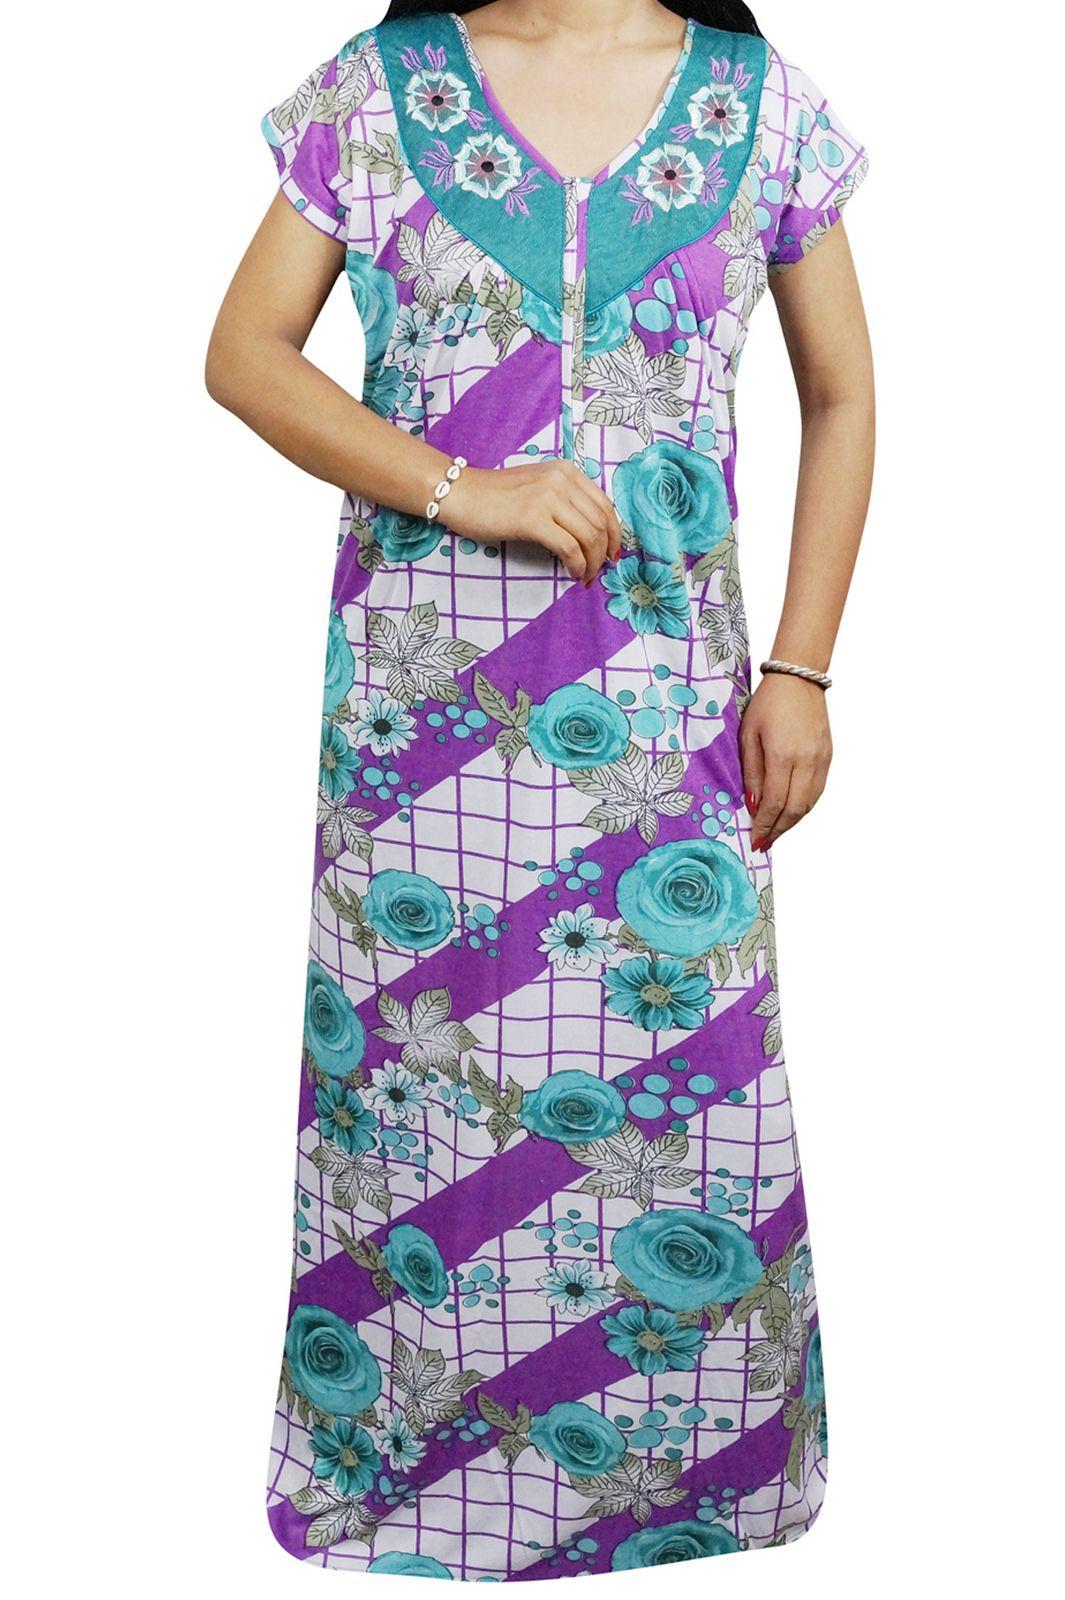 nighty  women  nightwear  maxi  nightgowns  summer  sleepwear  comfortable abcad6a38